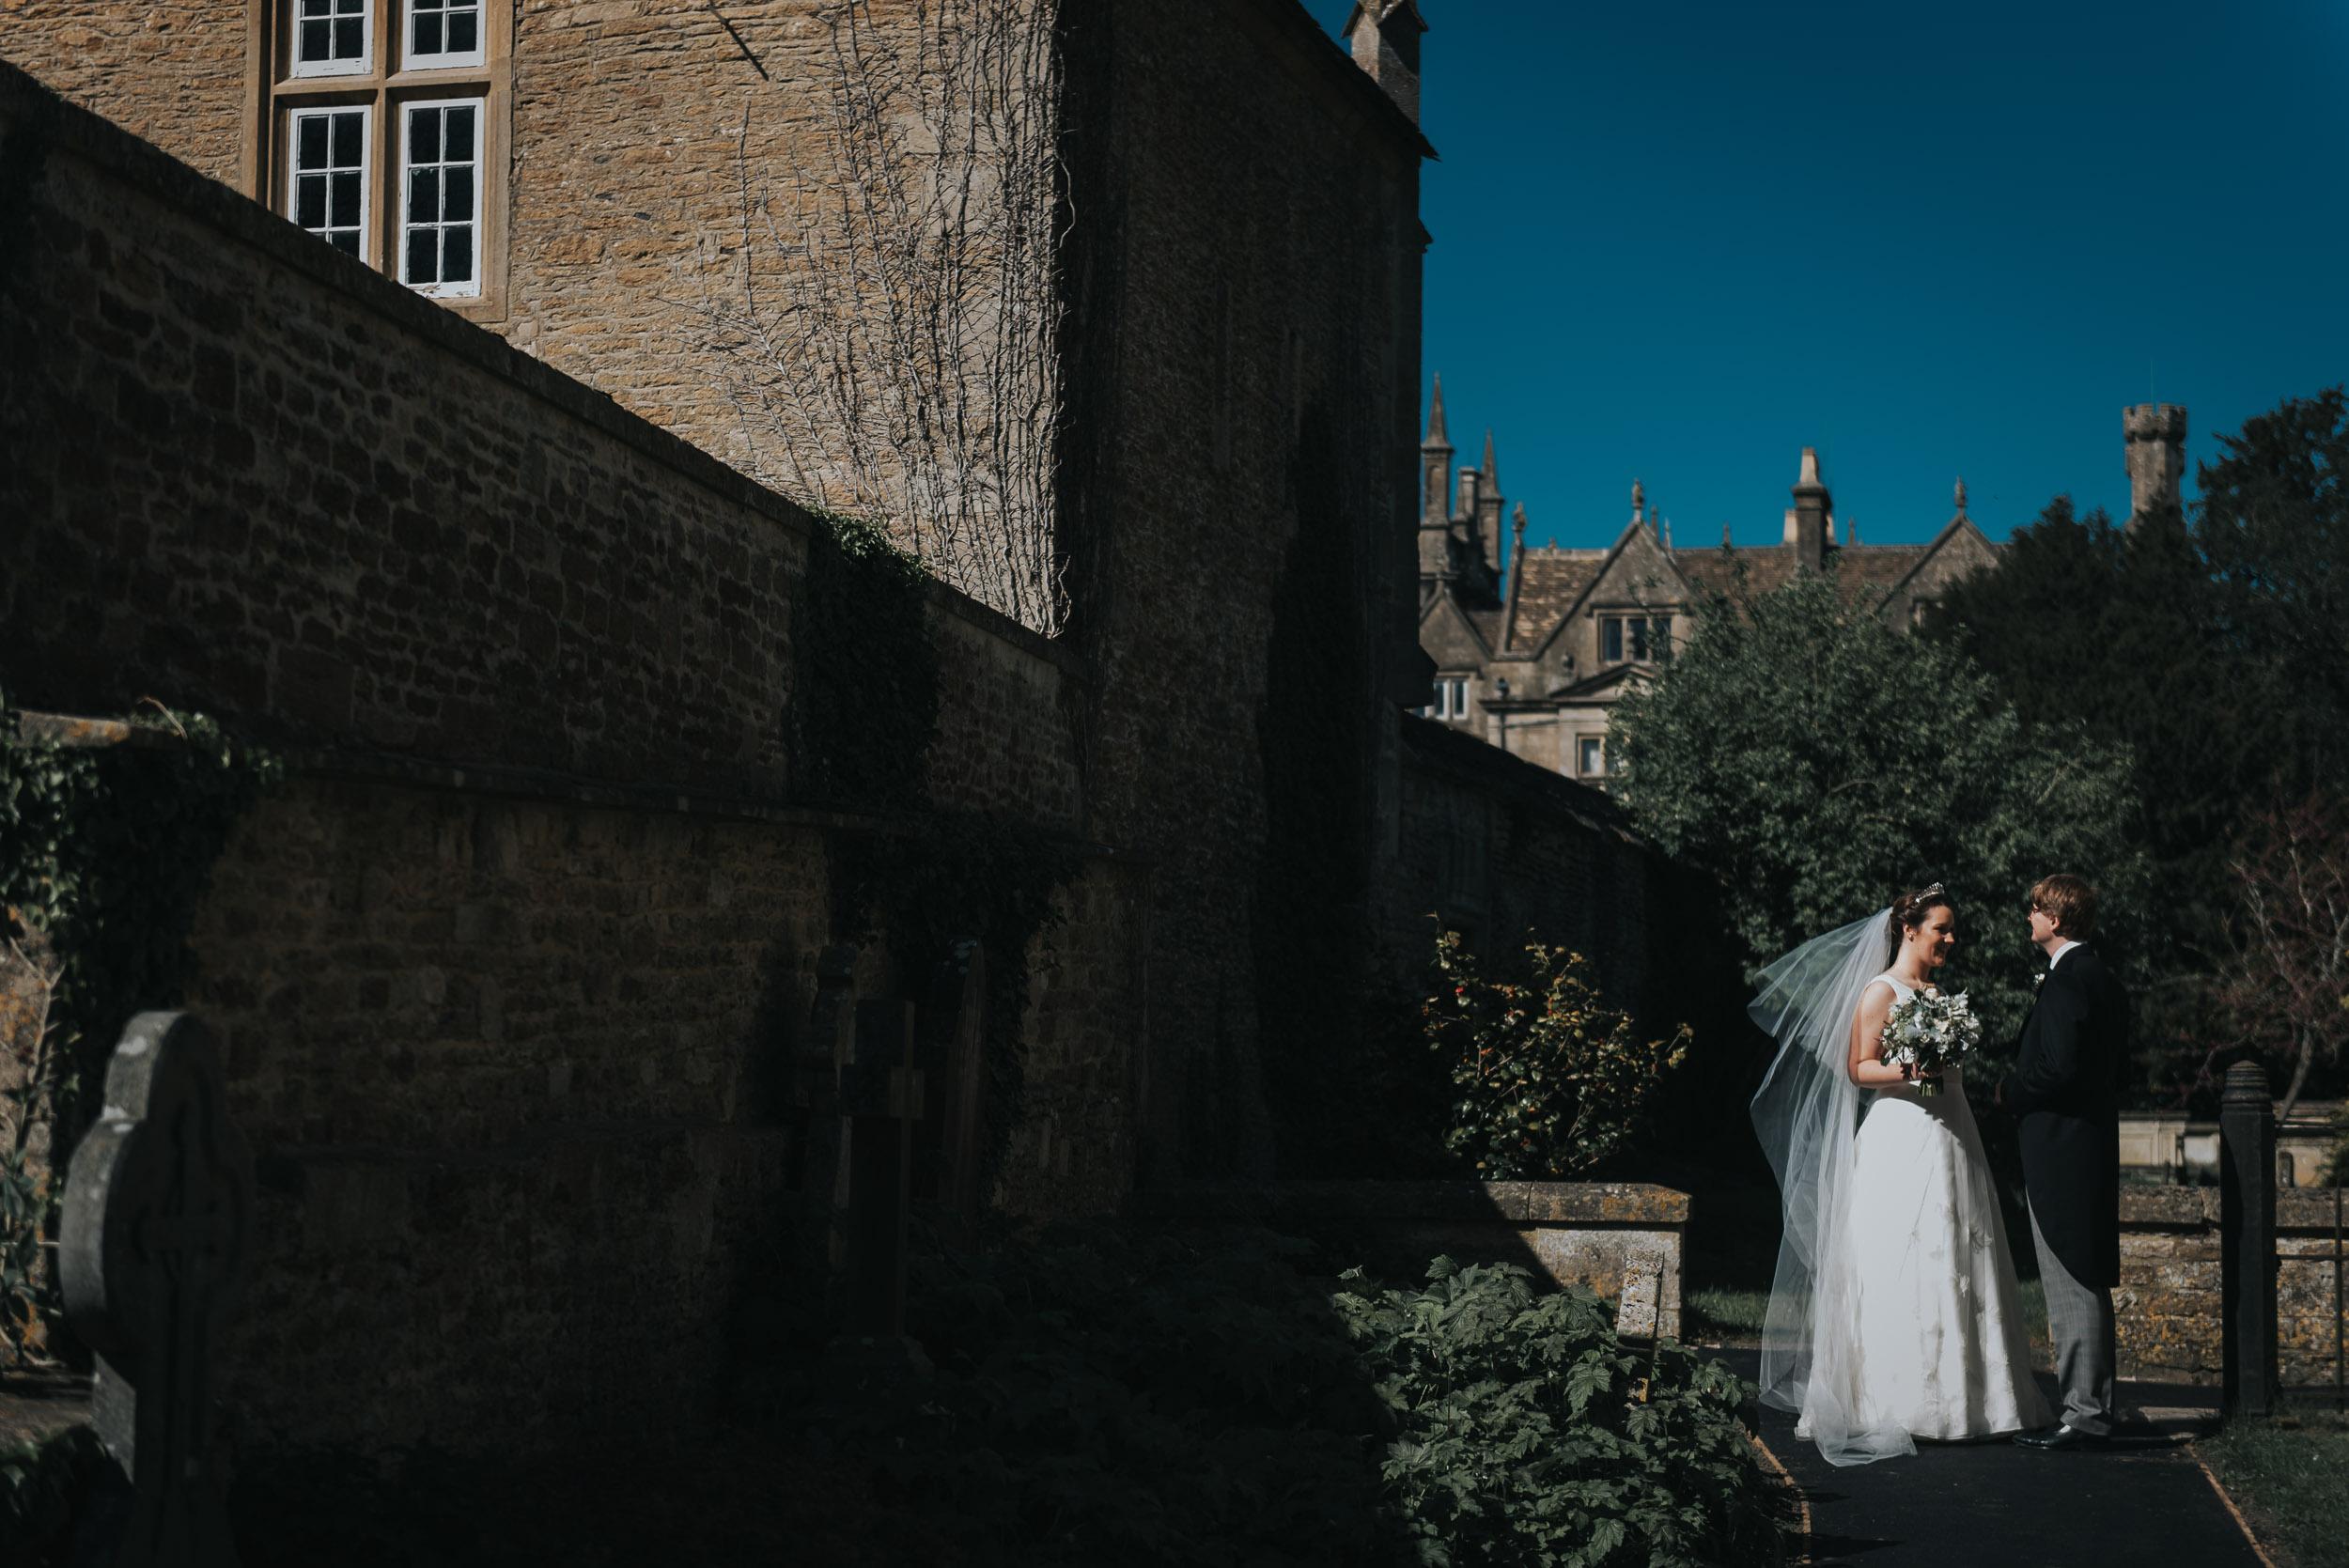 hamswell-house-wedding-photographer-w80.jpg